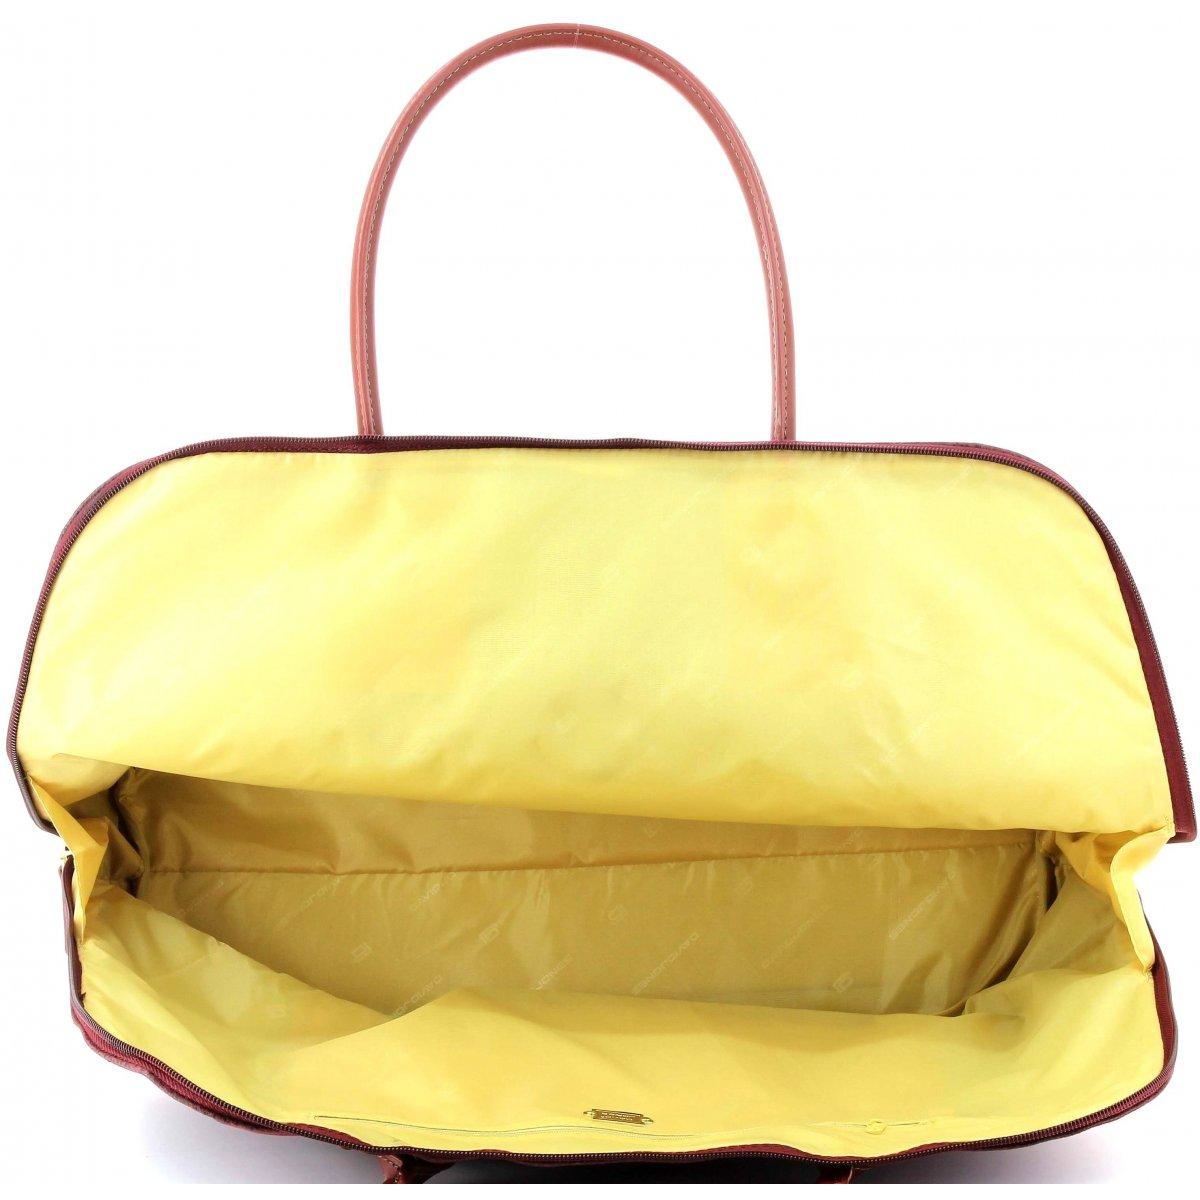 sac de voyage 48h david jones dj88885a couleur principale violet promotion. Black Bedroom Furniture Sets. Home Design Ideas